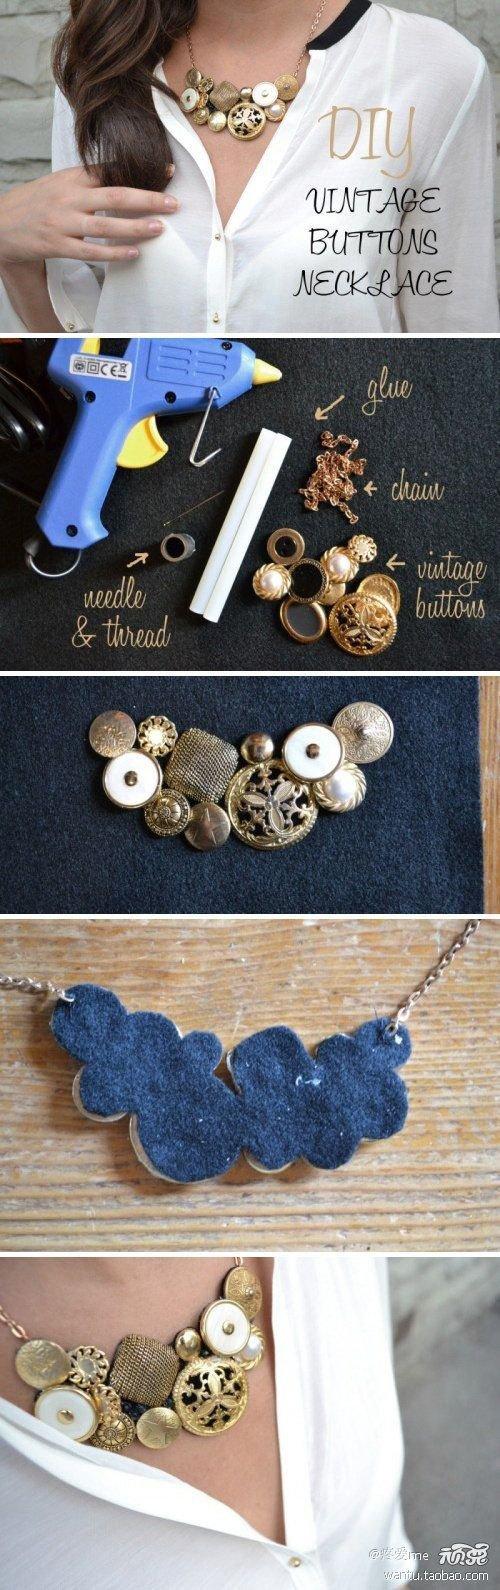 art,food,textile,thread,DIU,